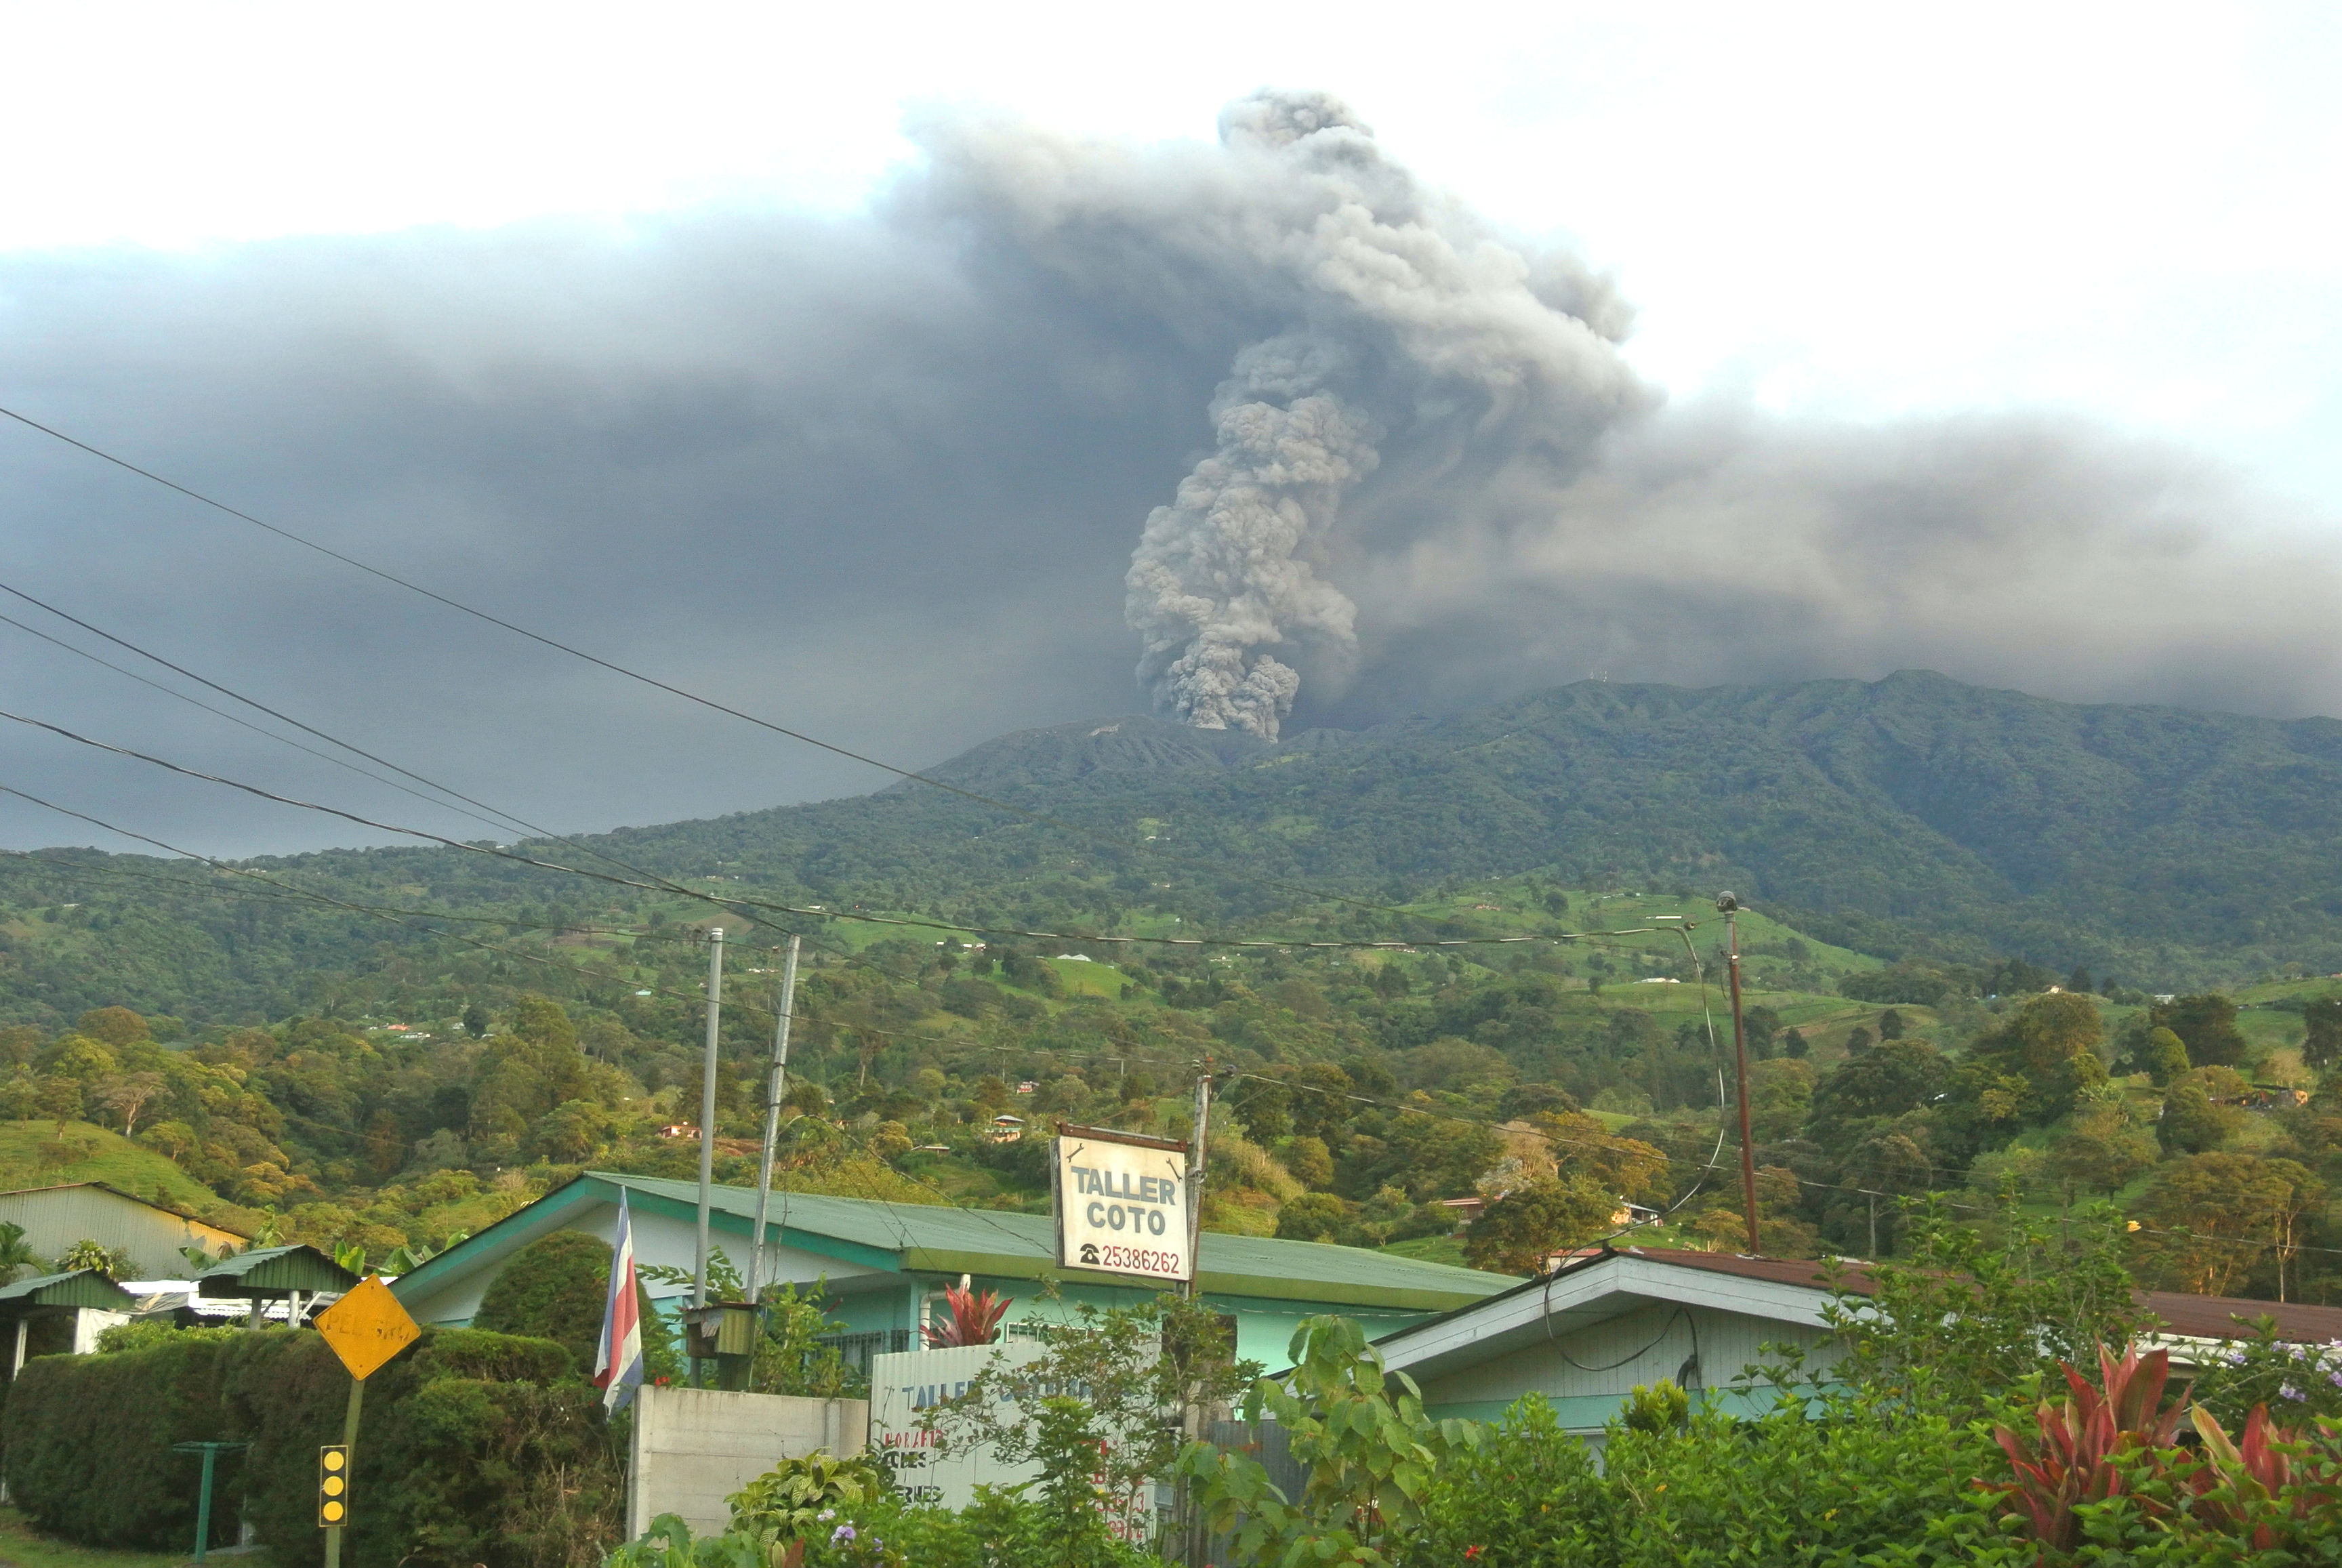 21September: Turrialba Vocano eruption from Santa Cruz at 5:30 am